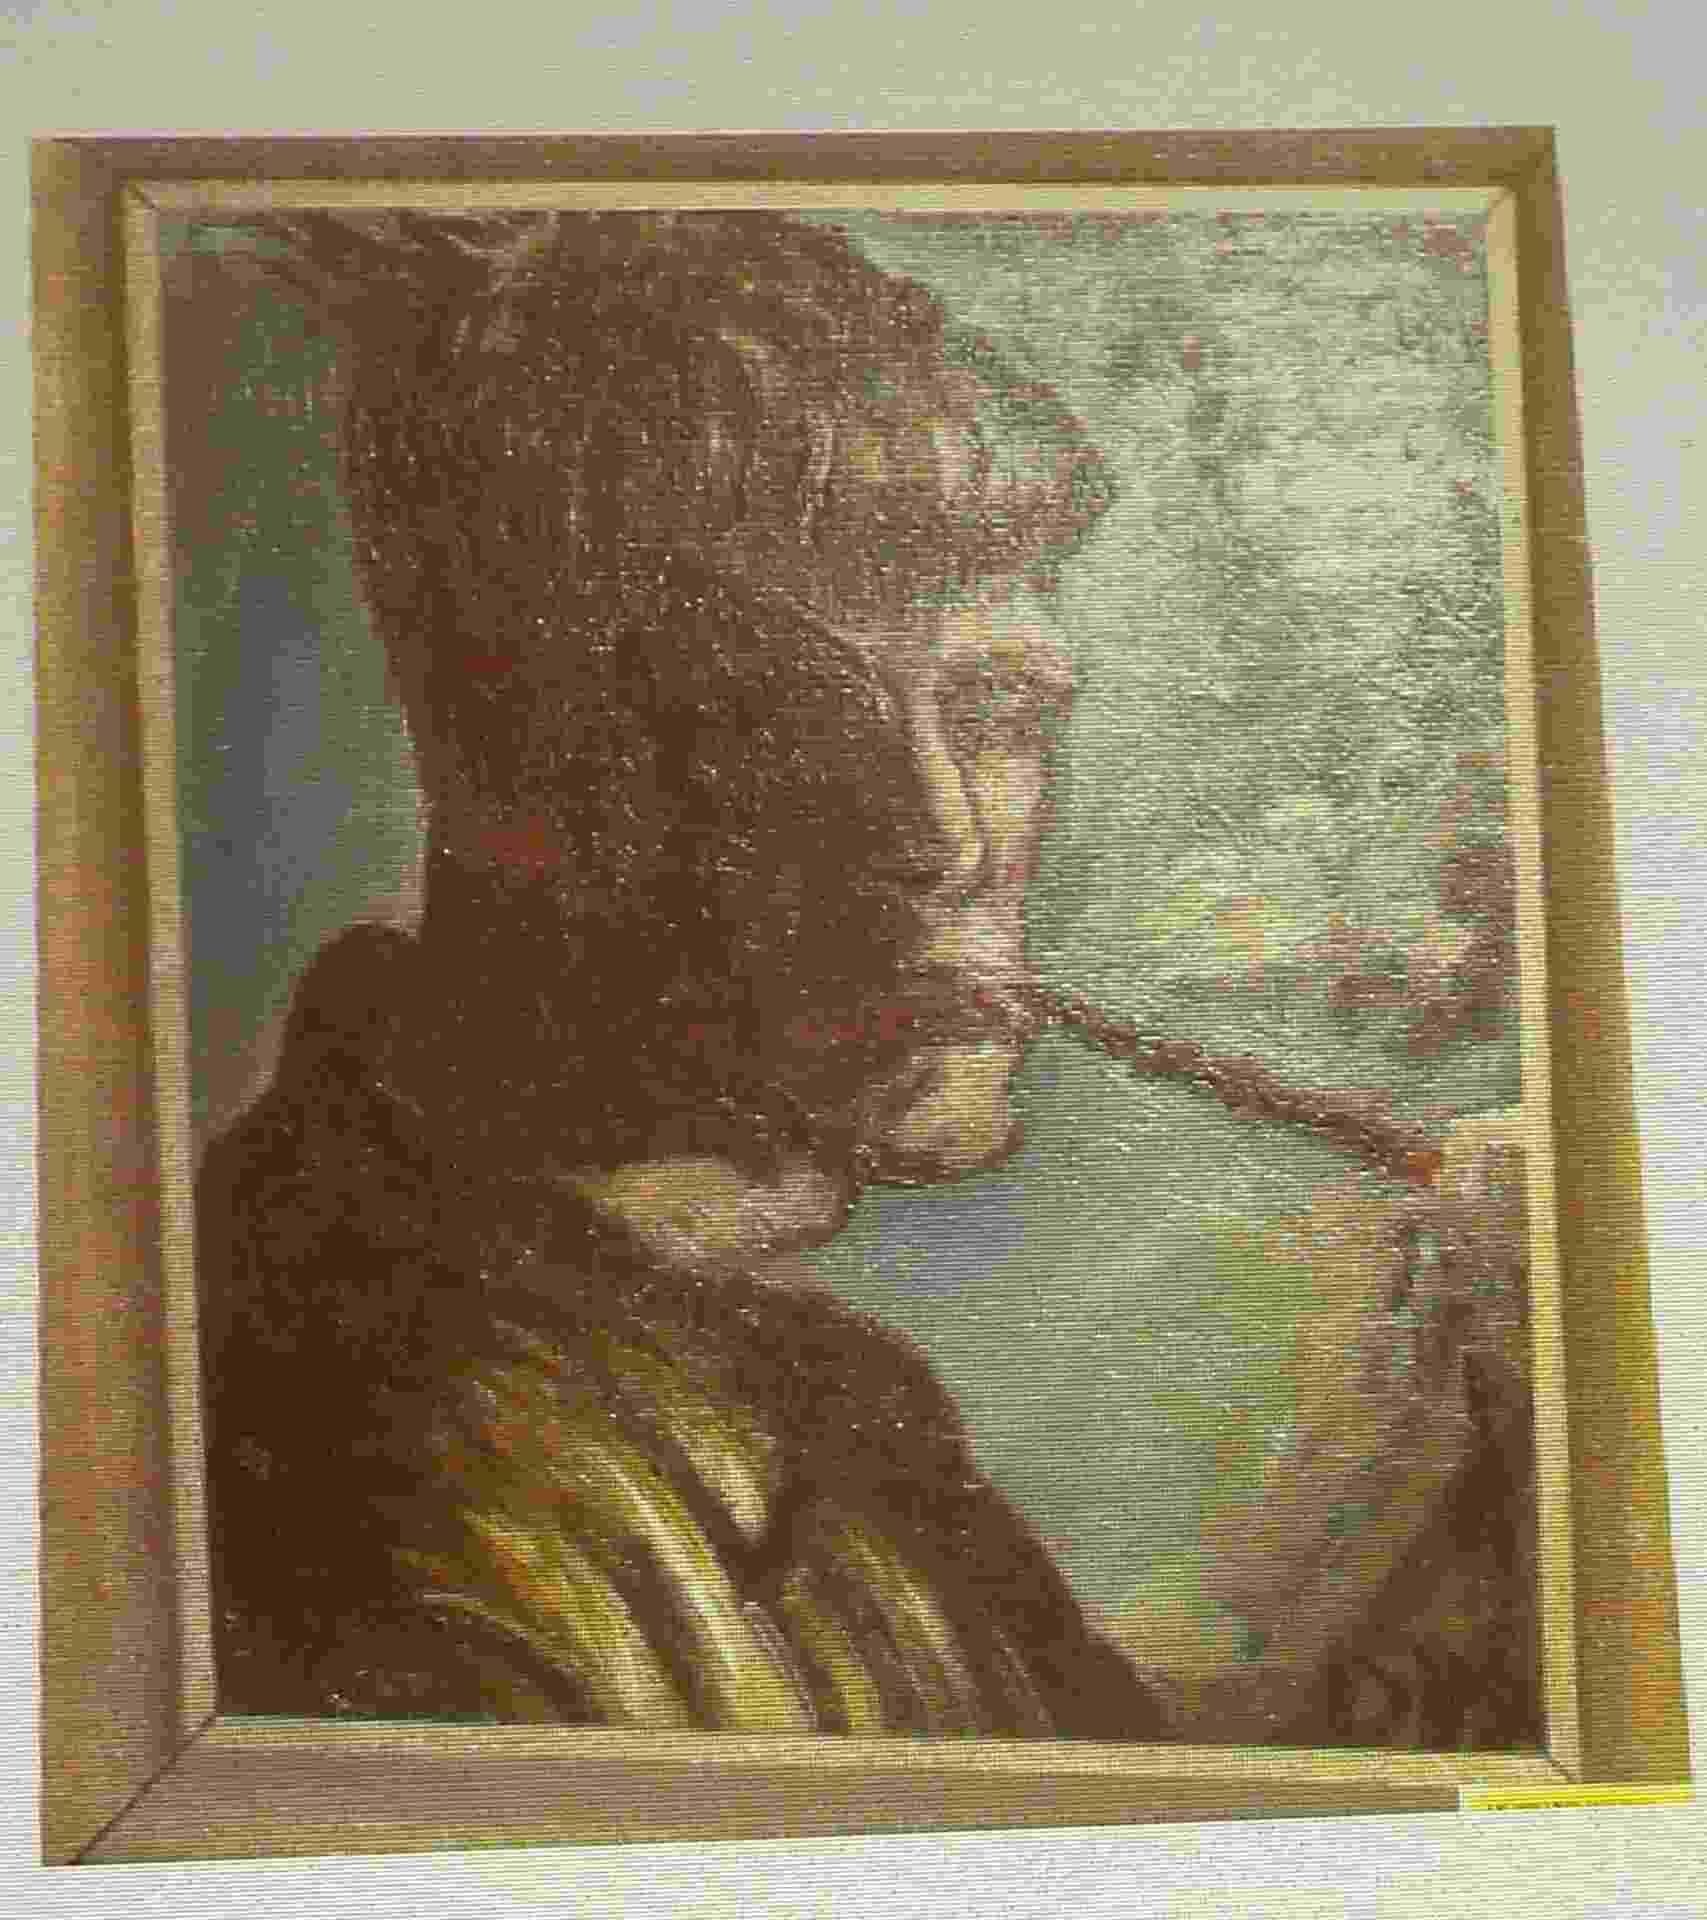 5.nov.2013- Otto Dix, autorretrato. Obras roubadas por nazistas - Reuters